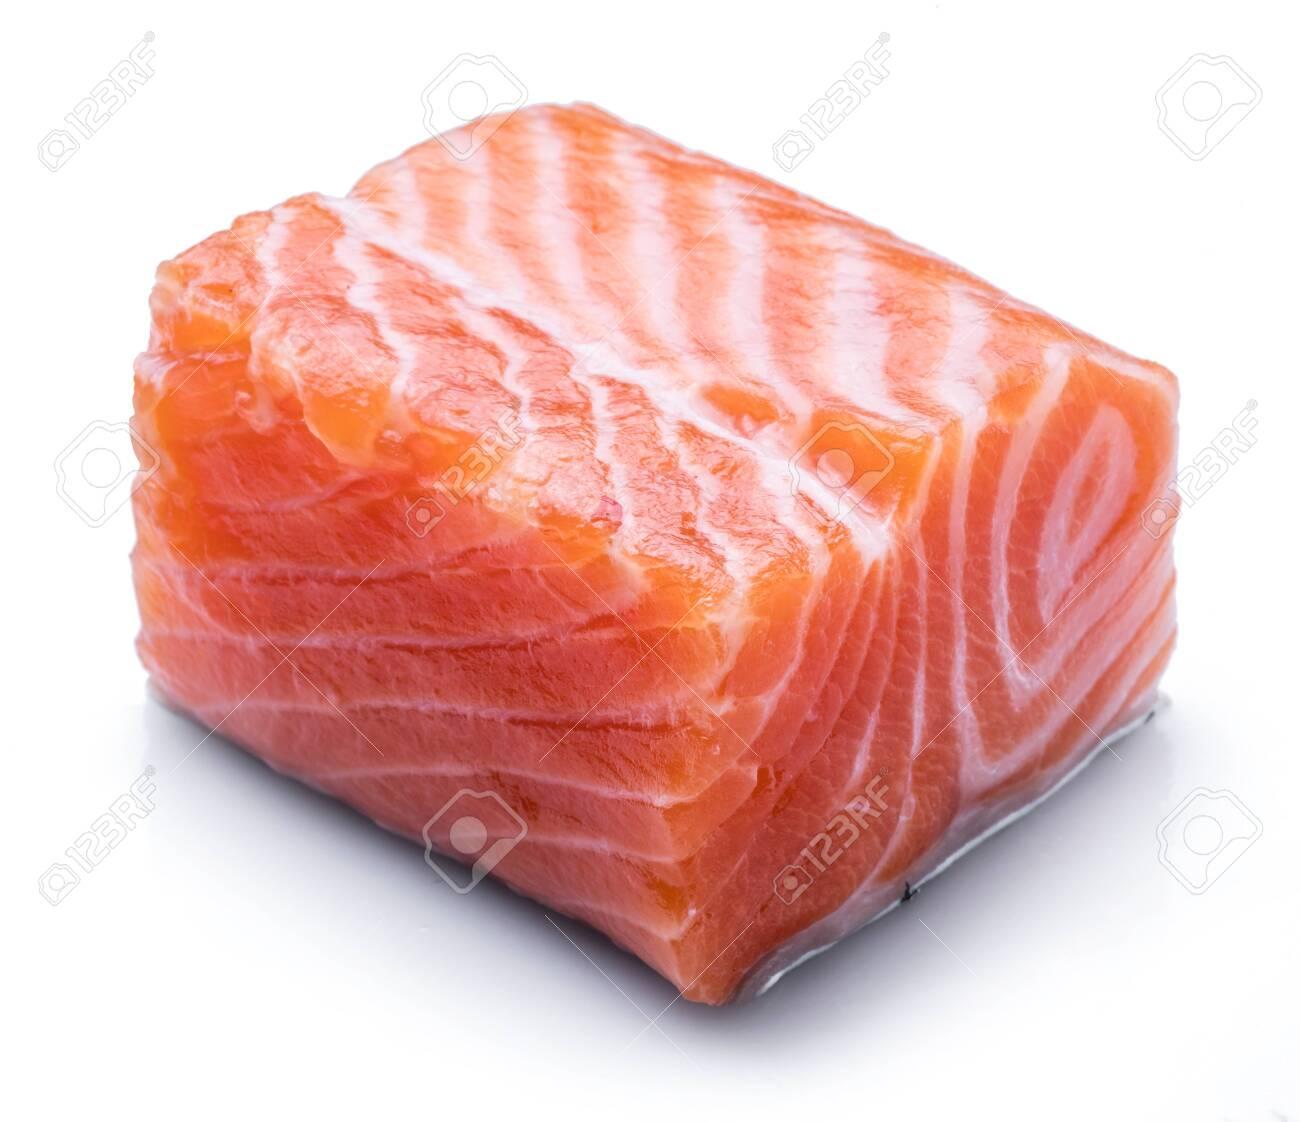 Fresh raw salmon fillet isolated on white background. - 136307753